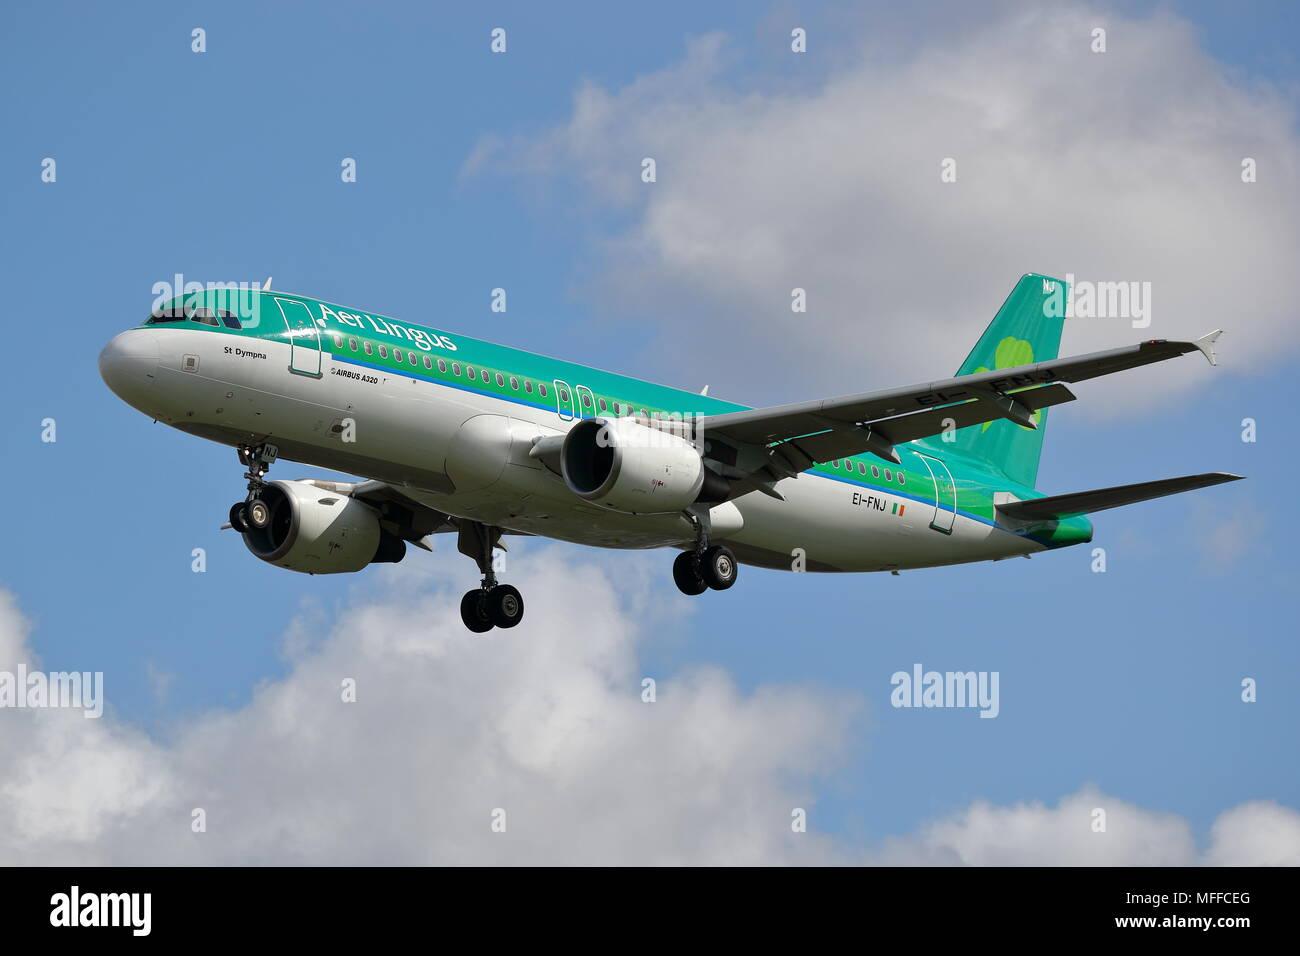 Aer Lingus Airbus A320 Ei Fnj Landing At London Heathrow Airport